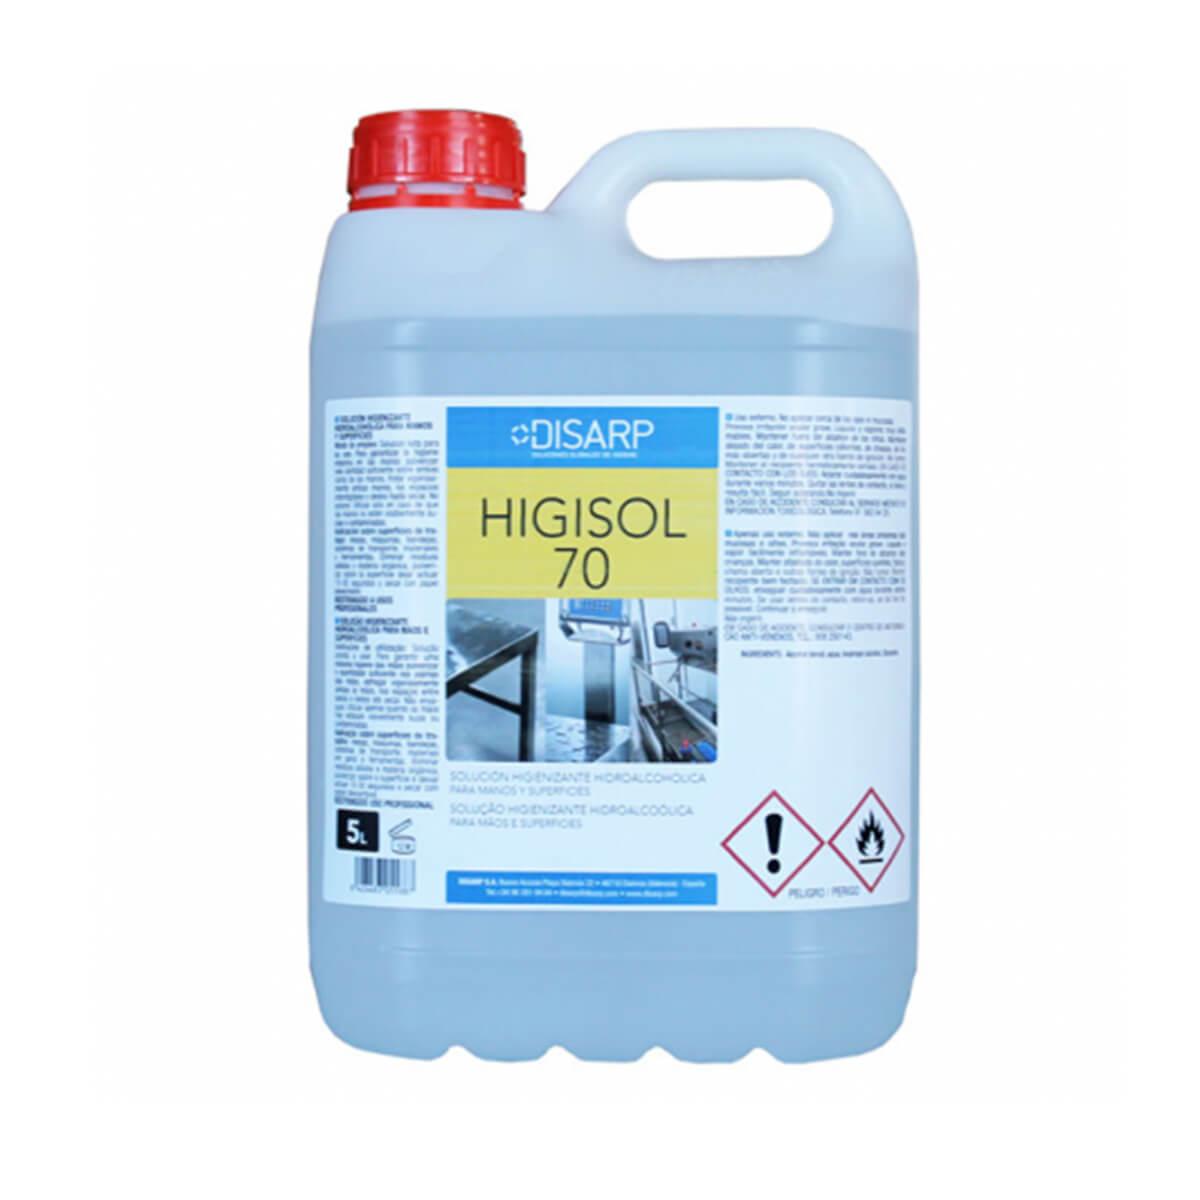 Gel higisol 70 5 litros